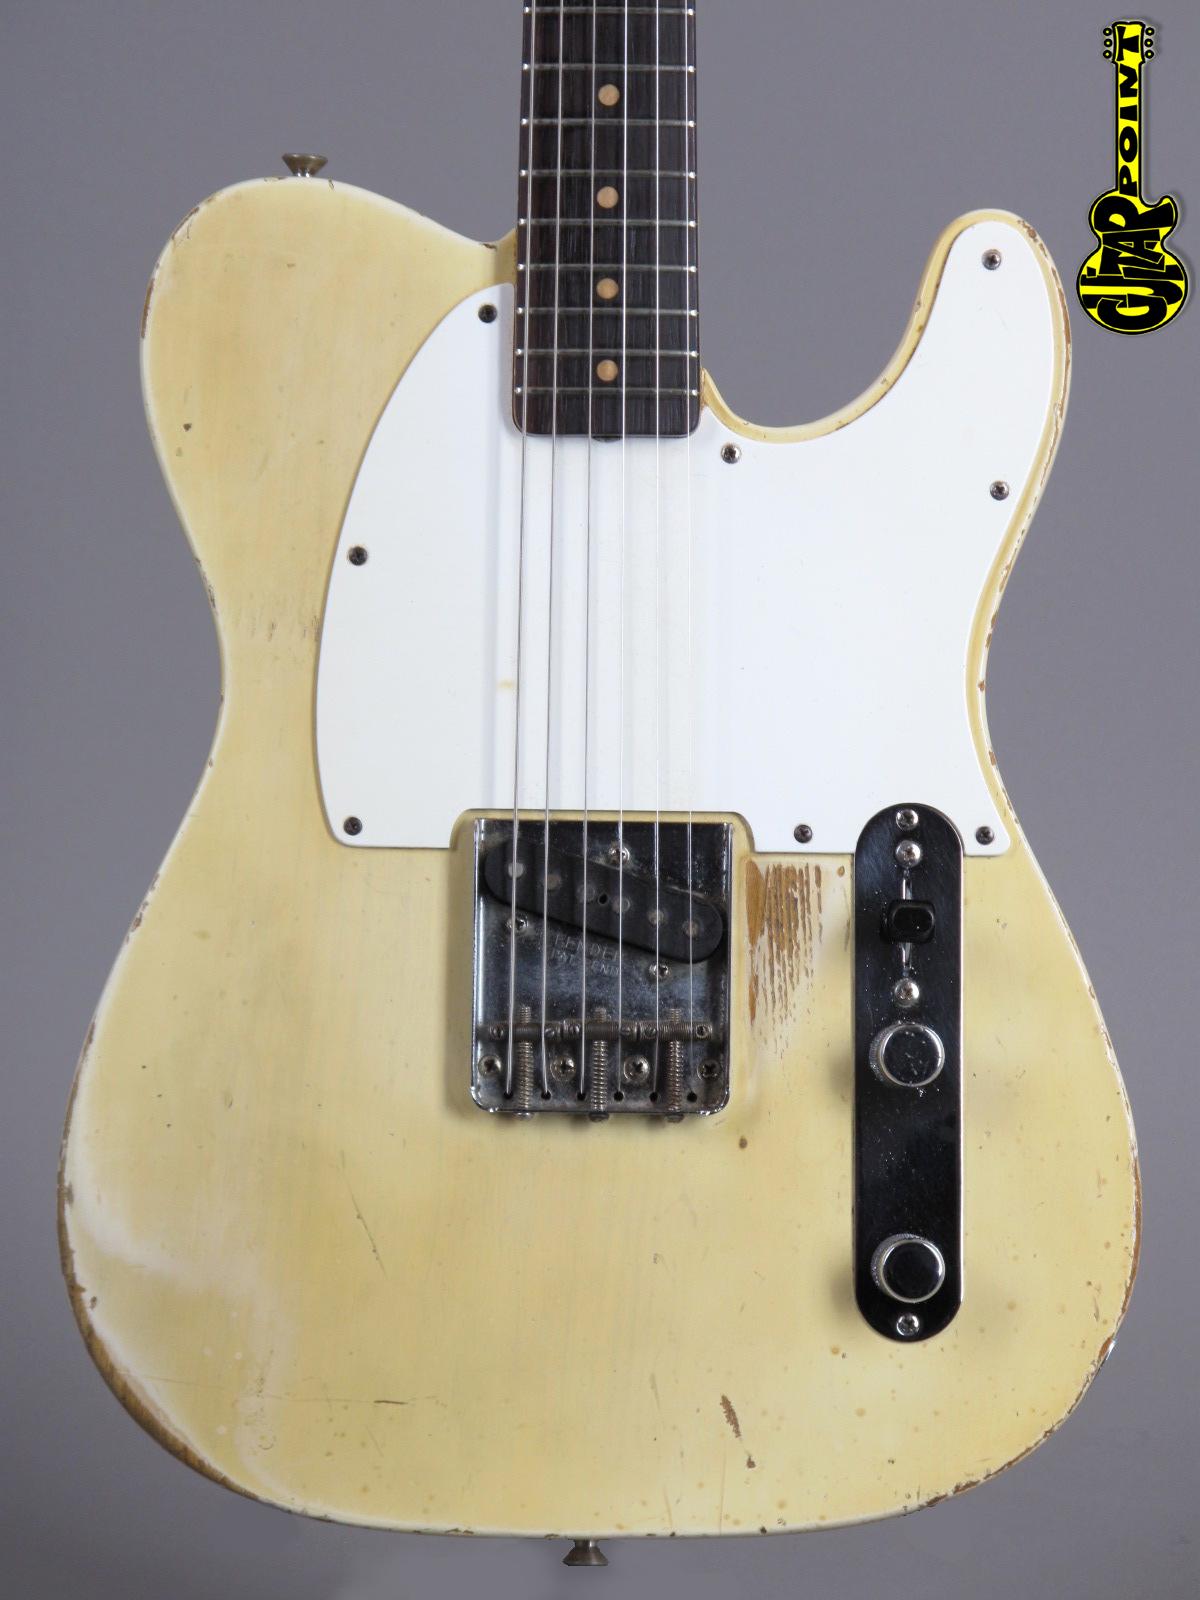 1960 Fender Esquire (Telecaster) - Blond